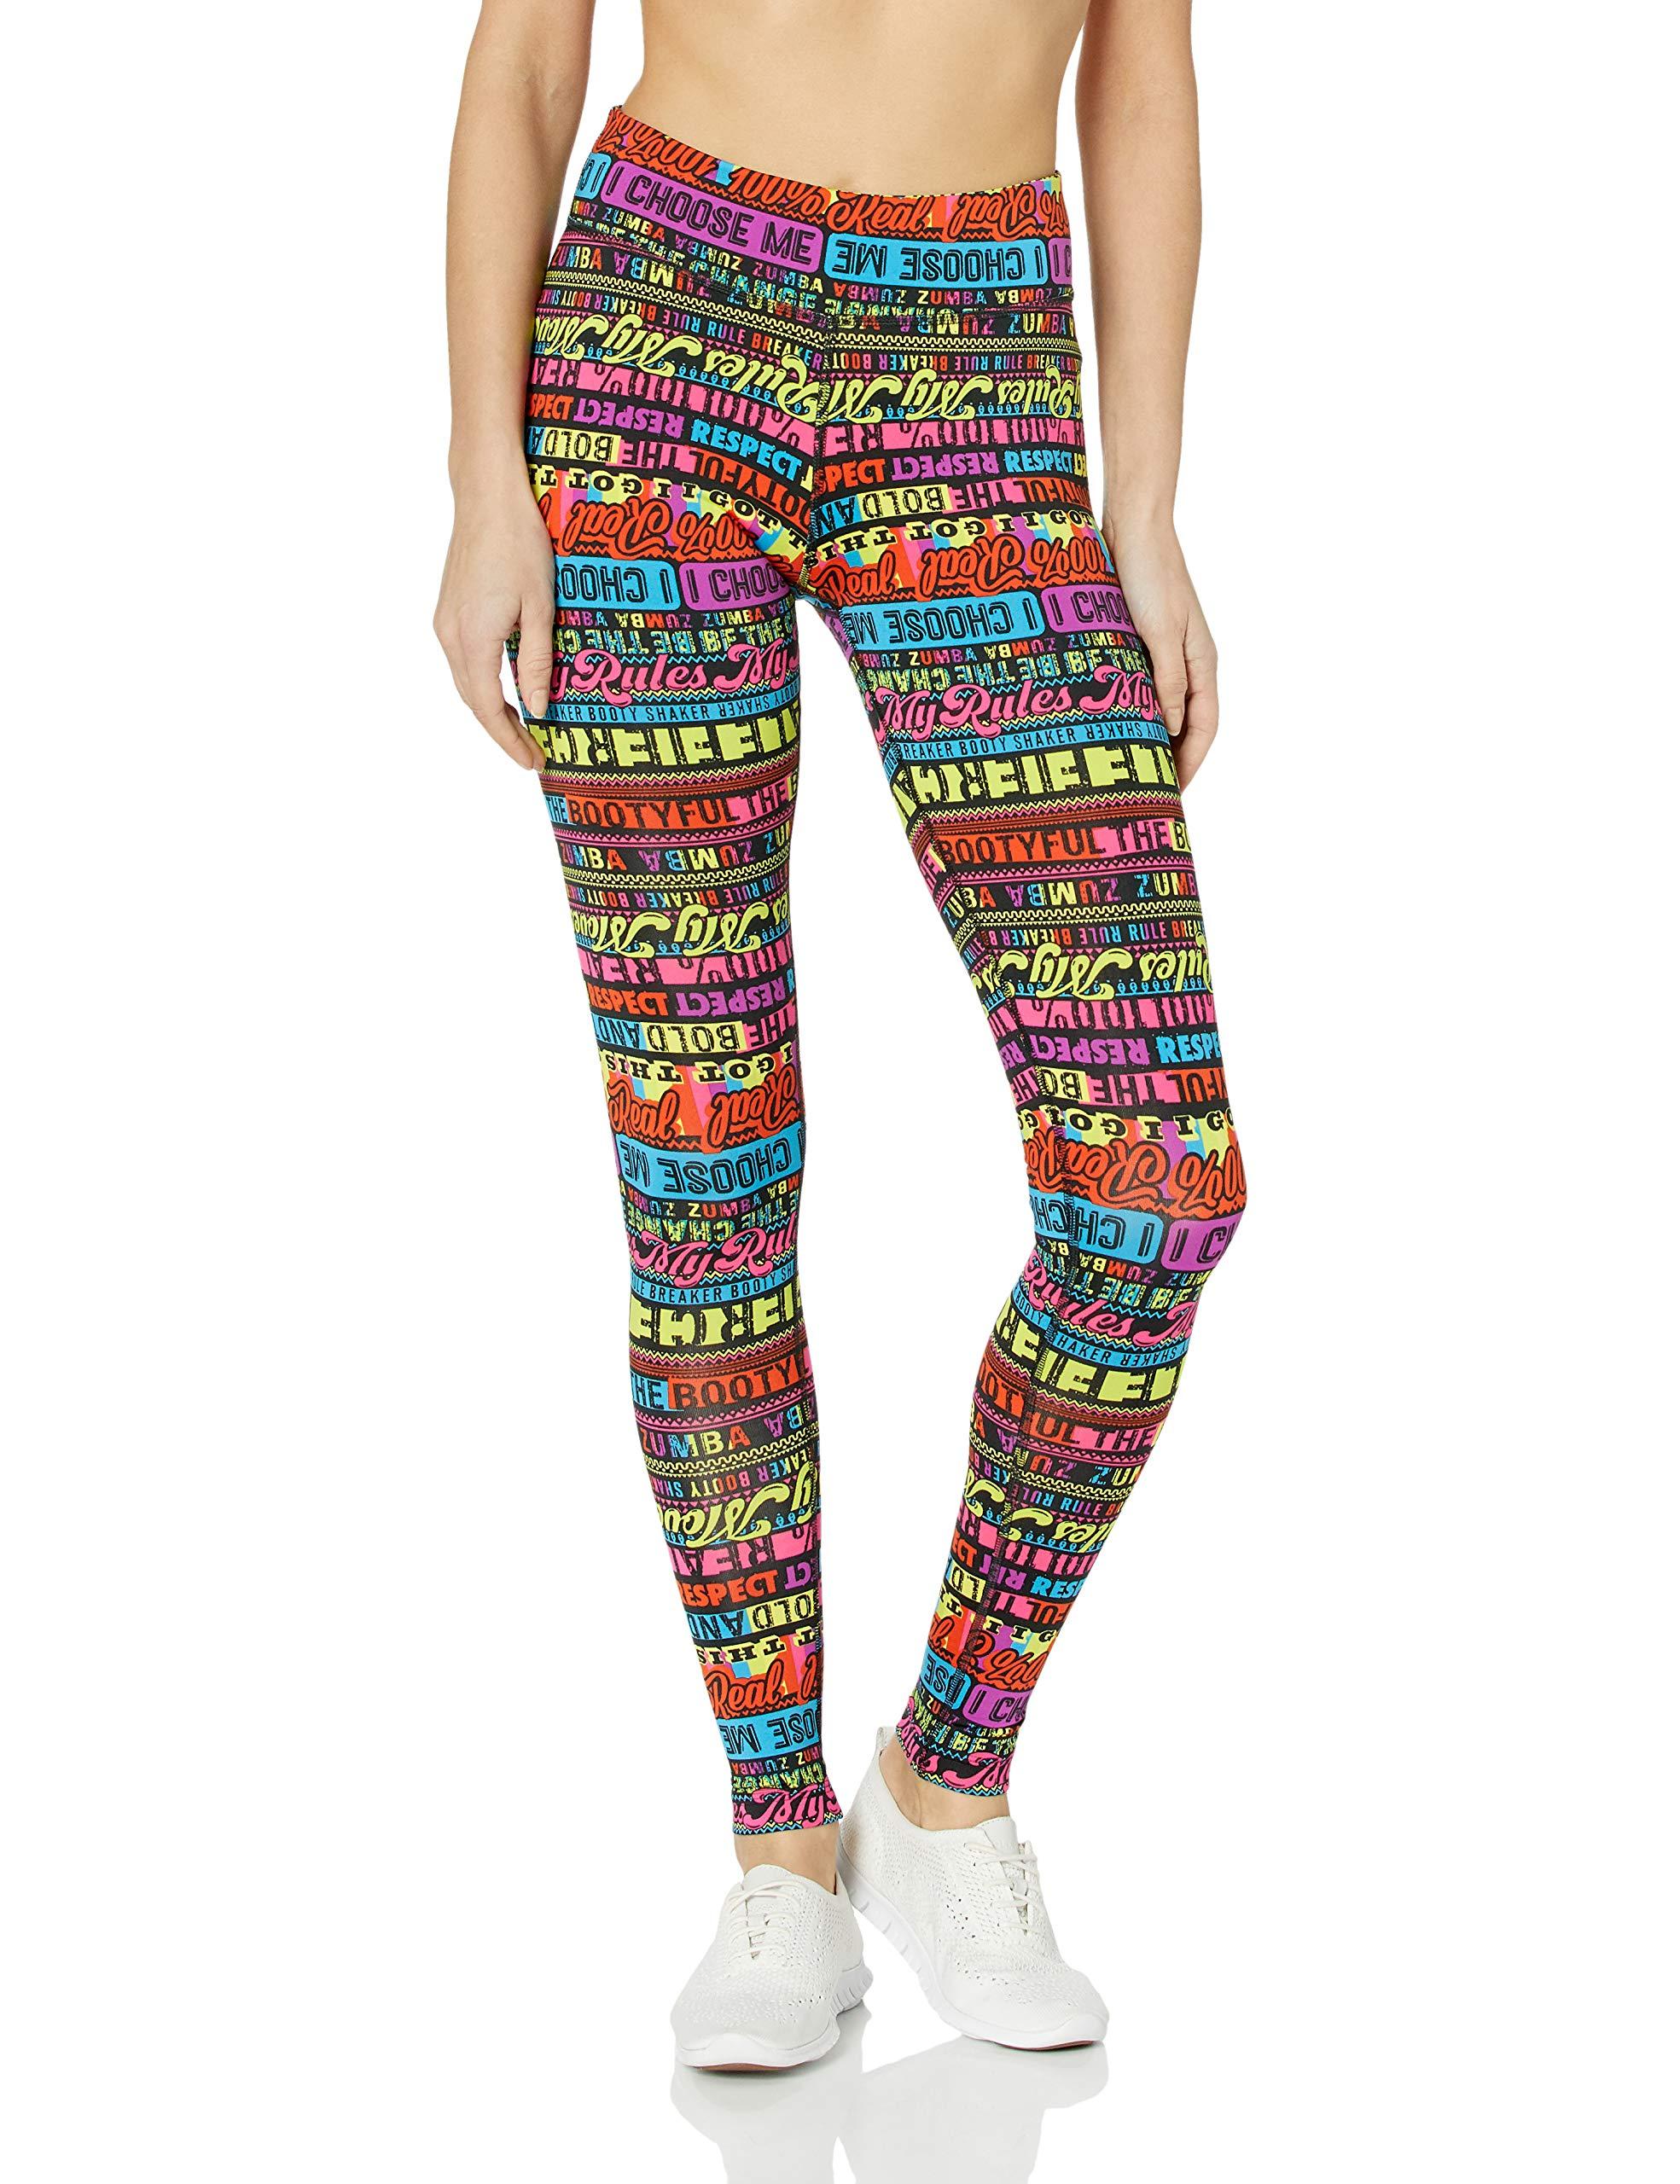 11b5f2dcbc5 Zumba Women s Wide Waistband Print Capri Legging with Compression product  image